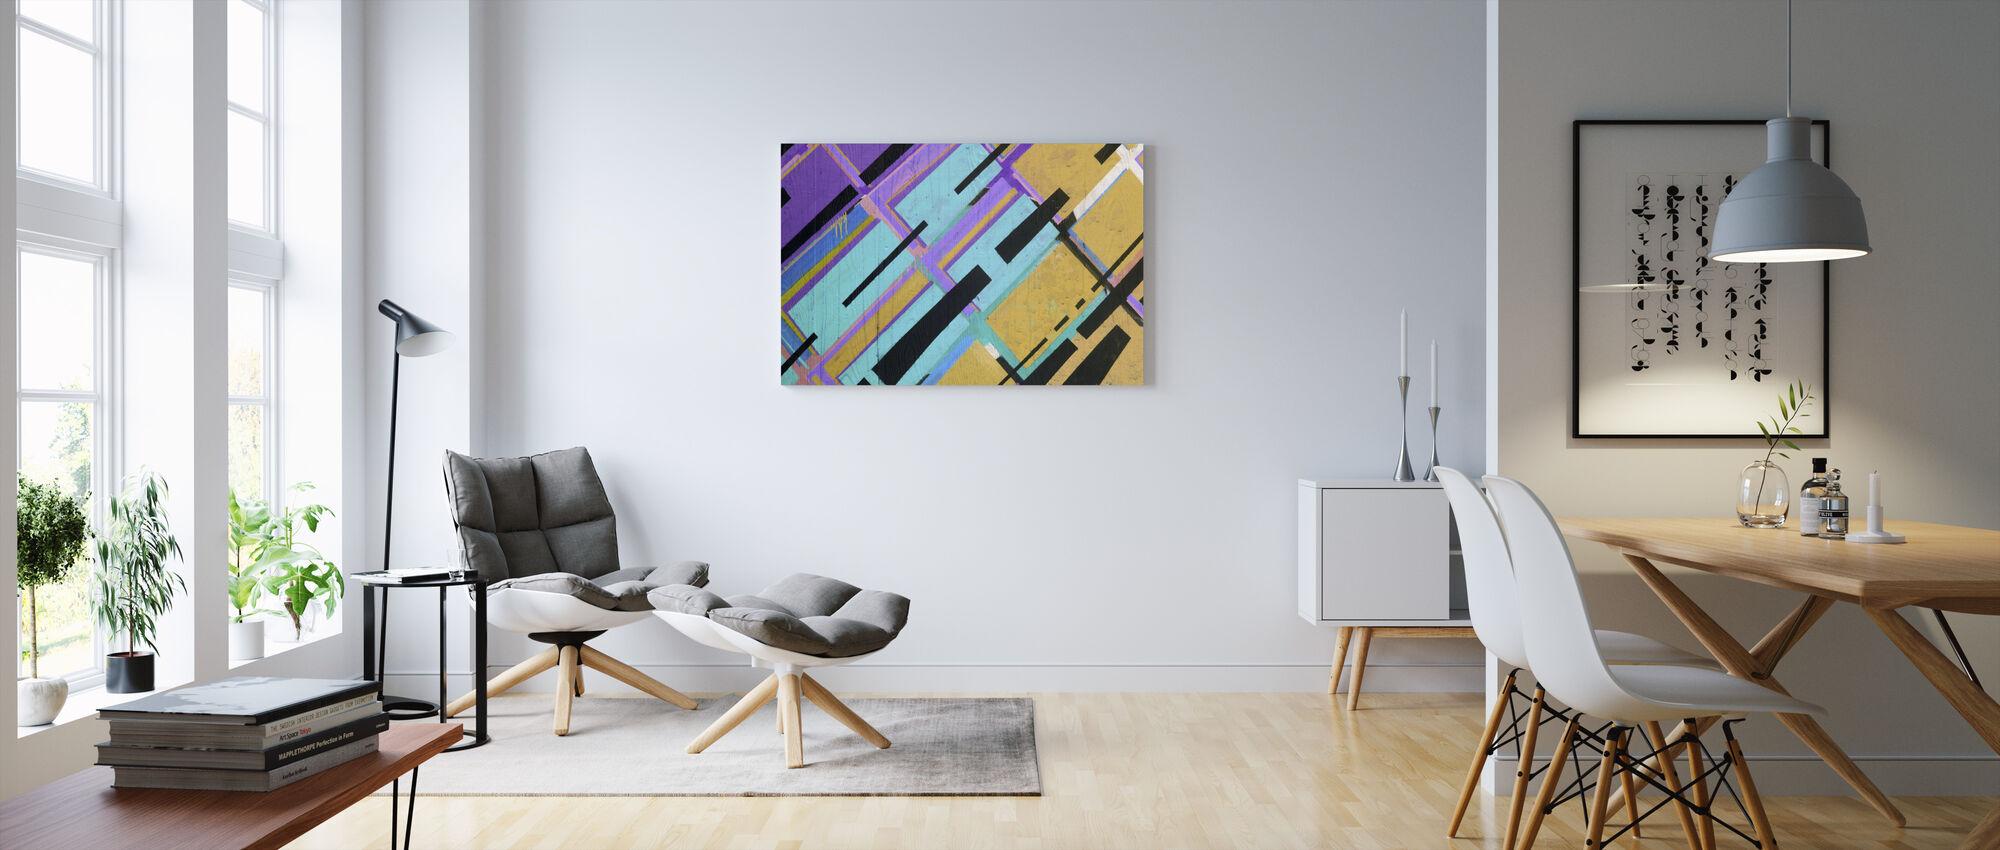 Colorful Street Art - Canvas print - Living Room